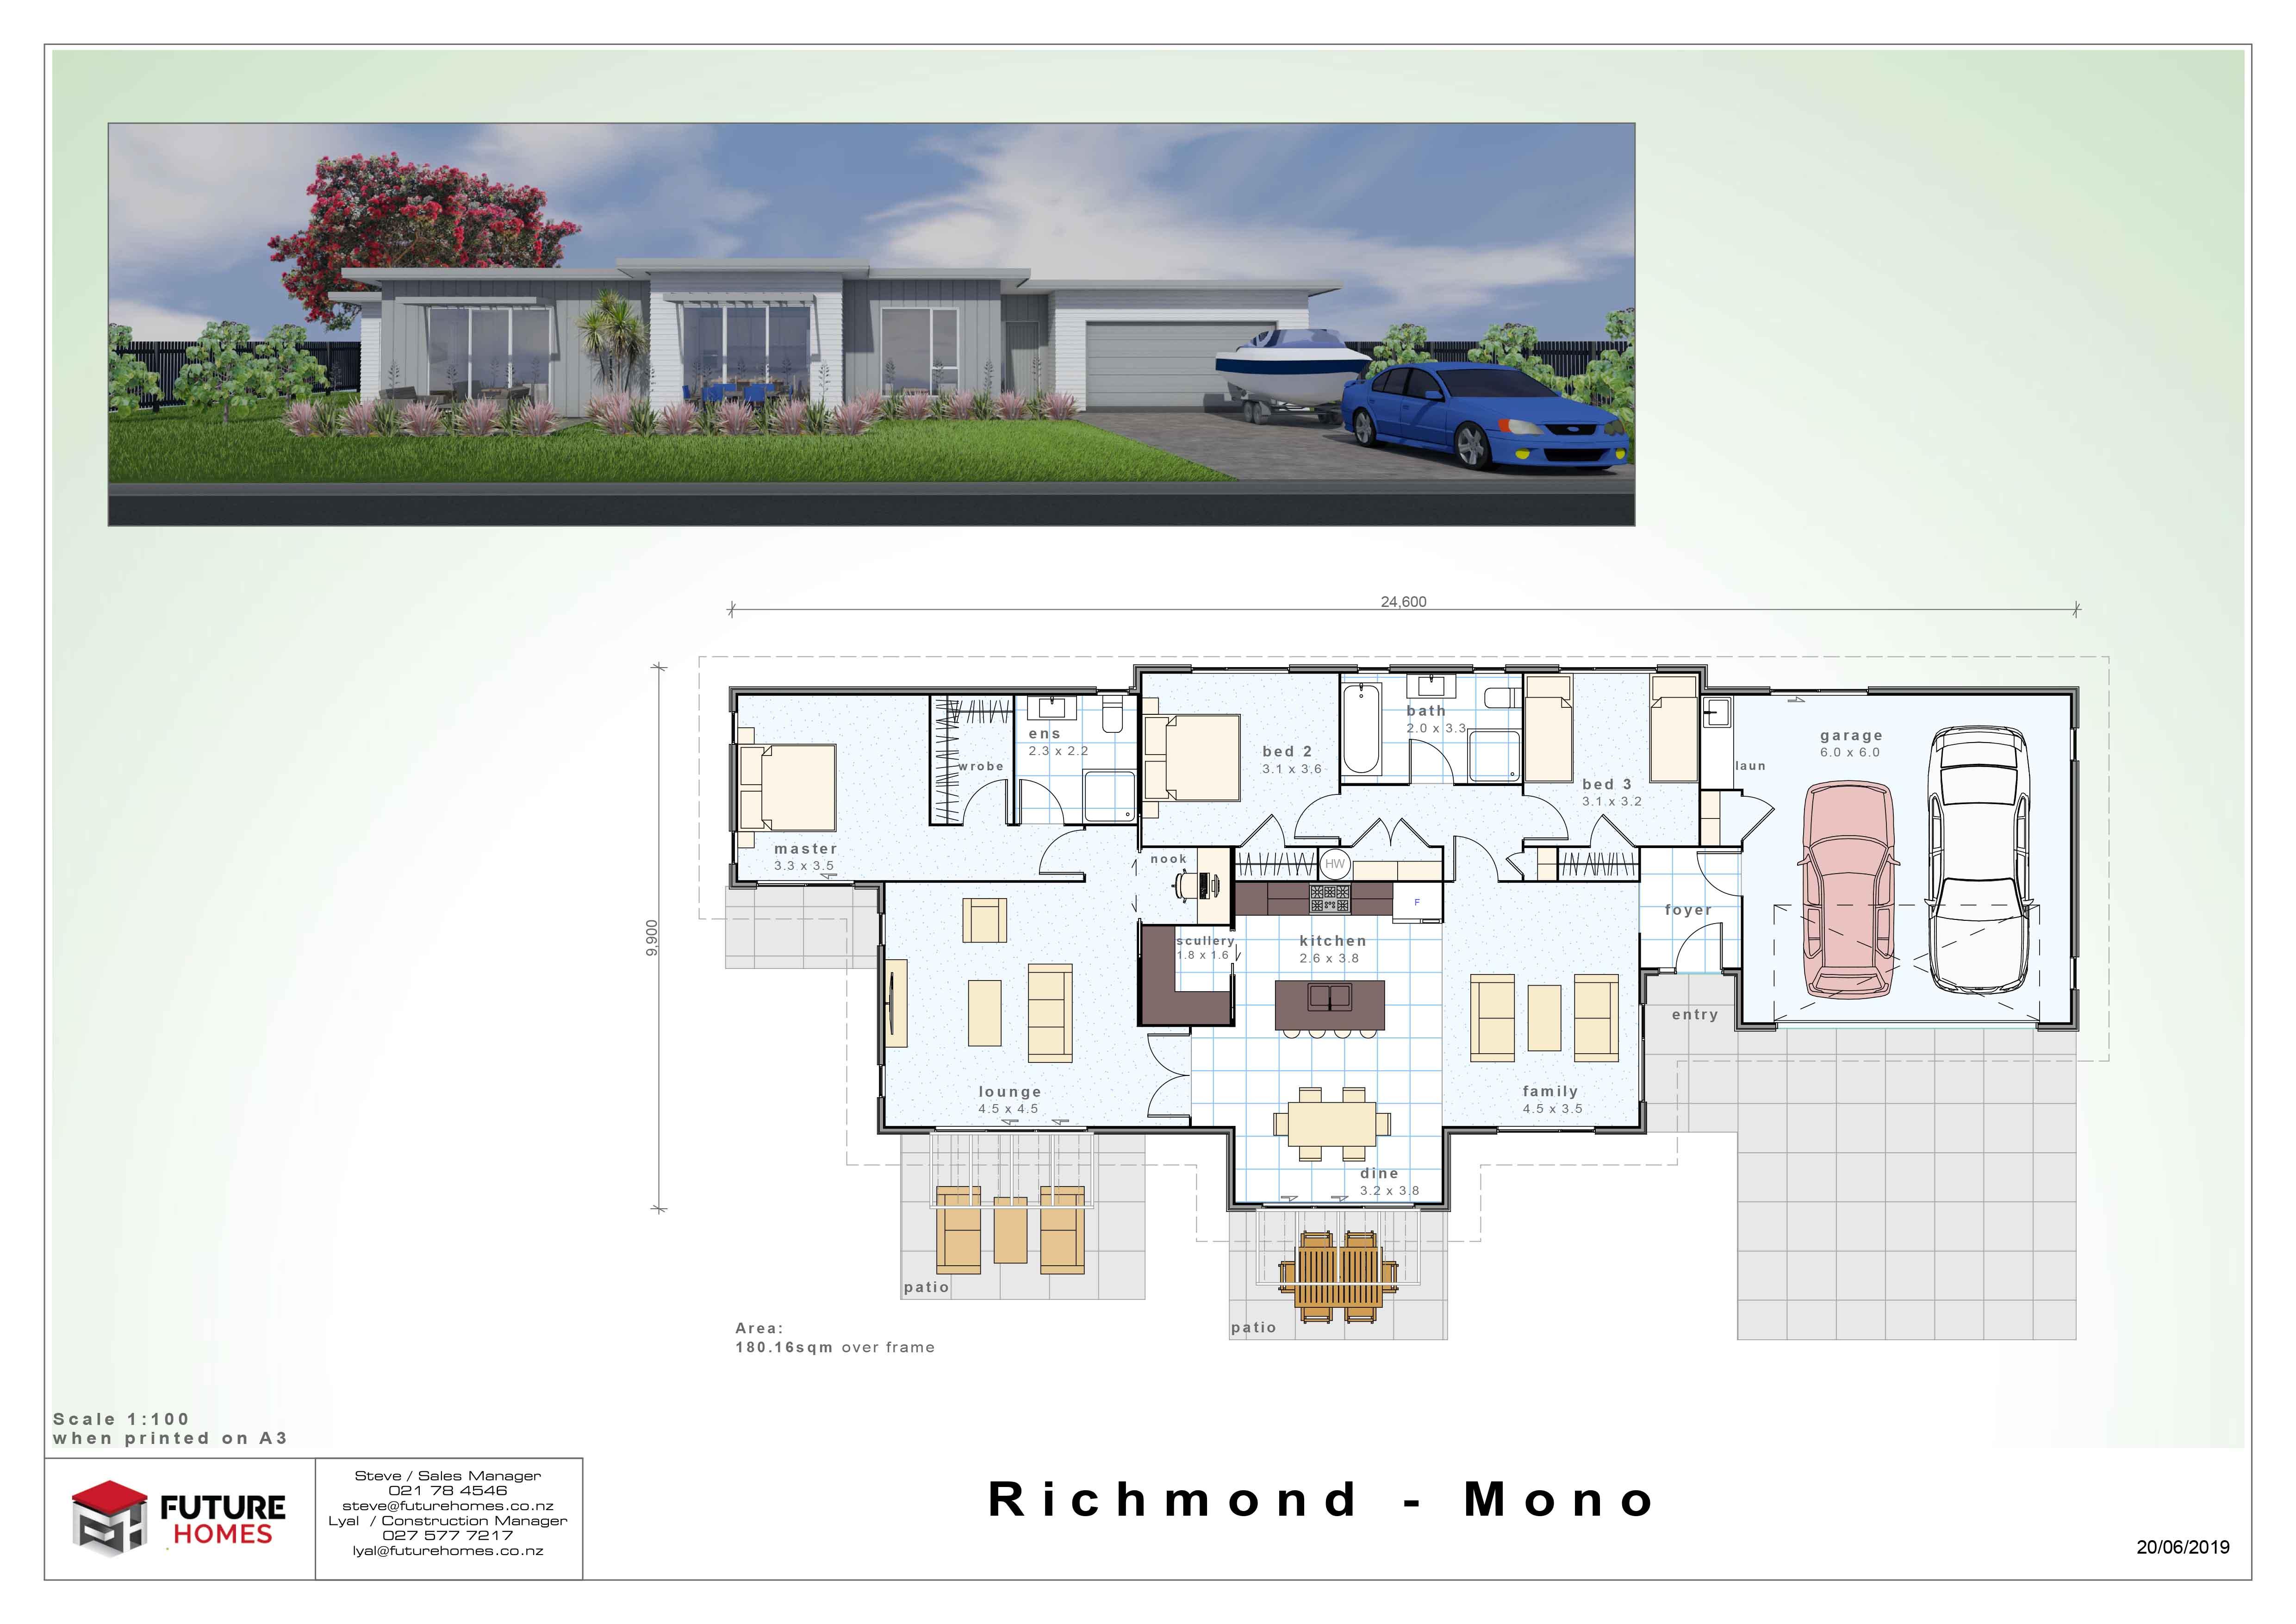 Richmond – Mono